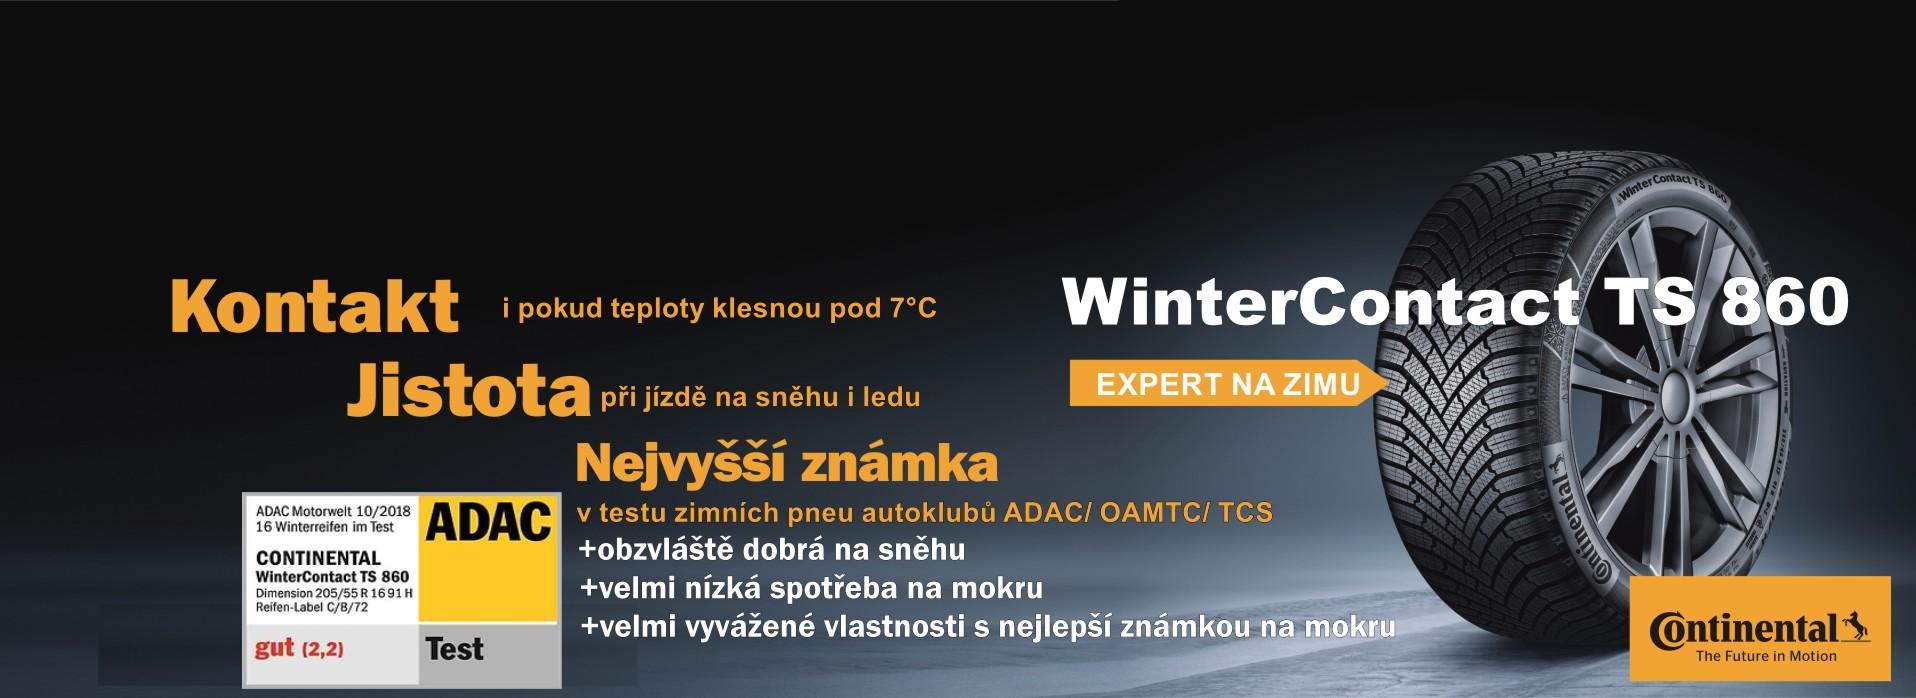 winter-contact-ts-860